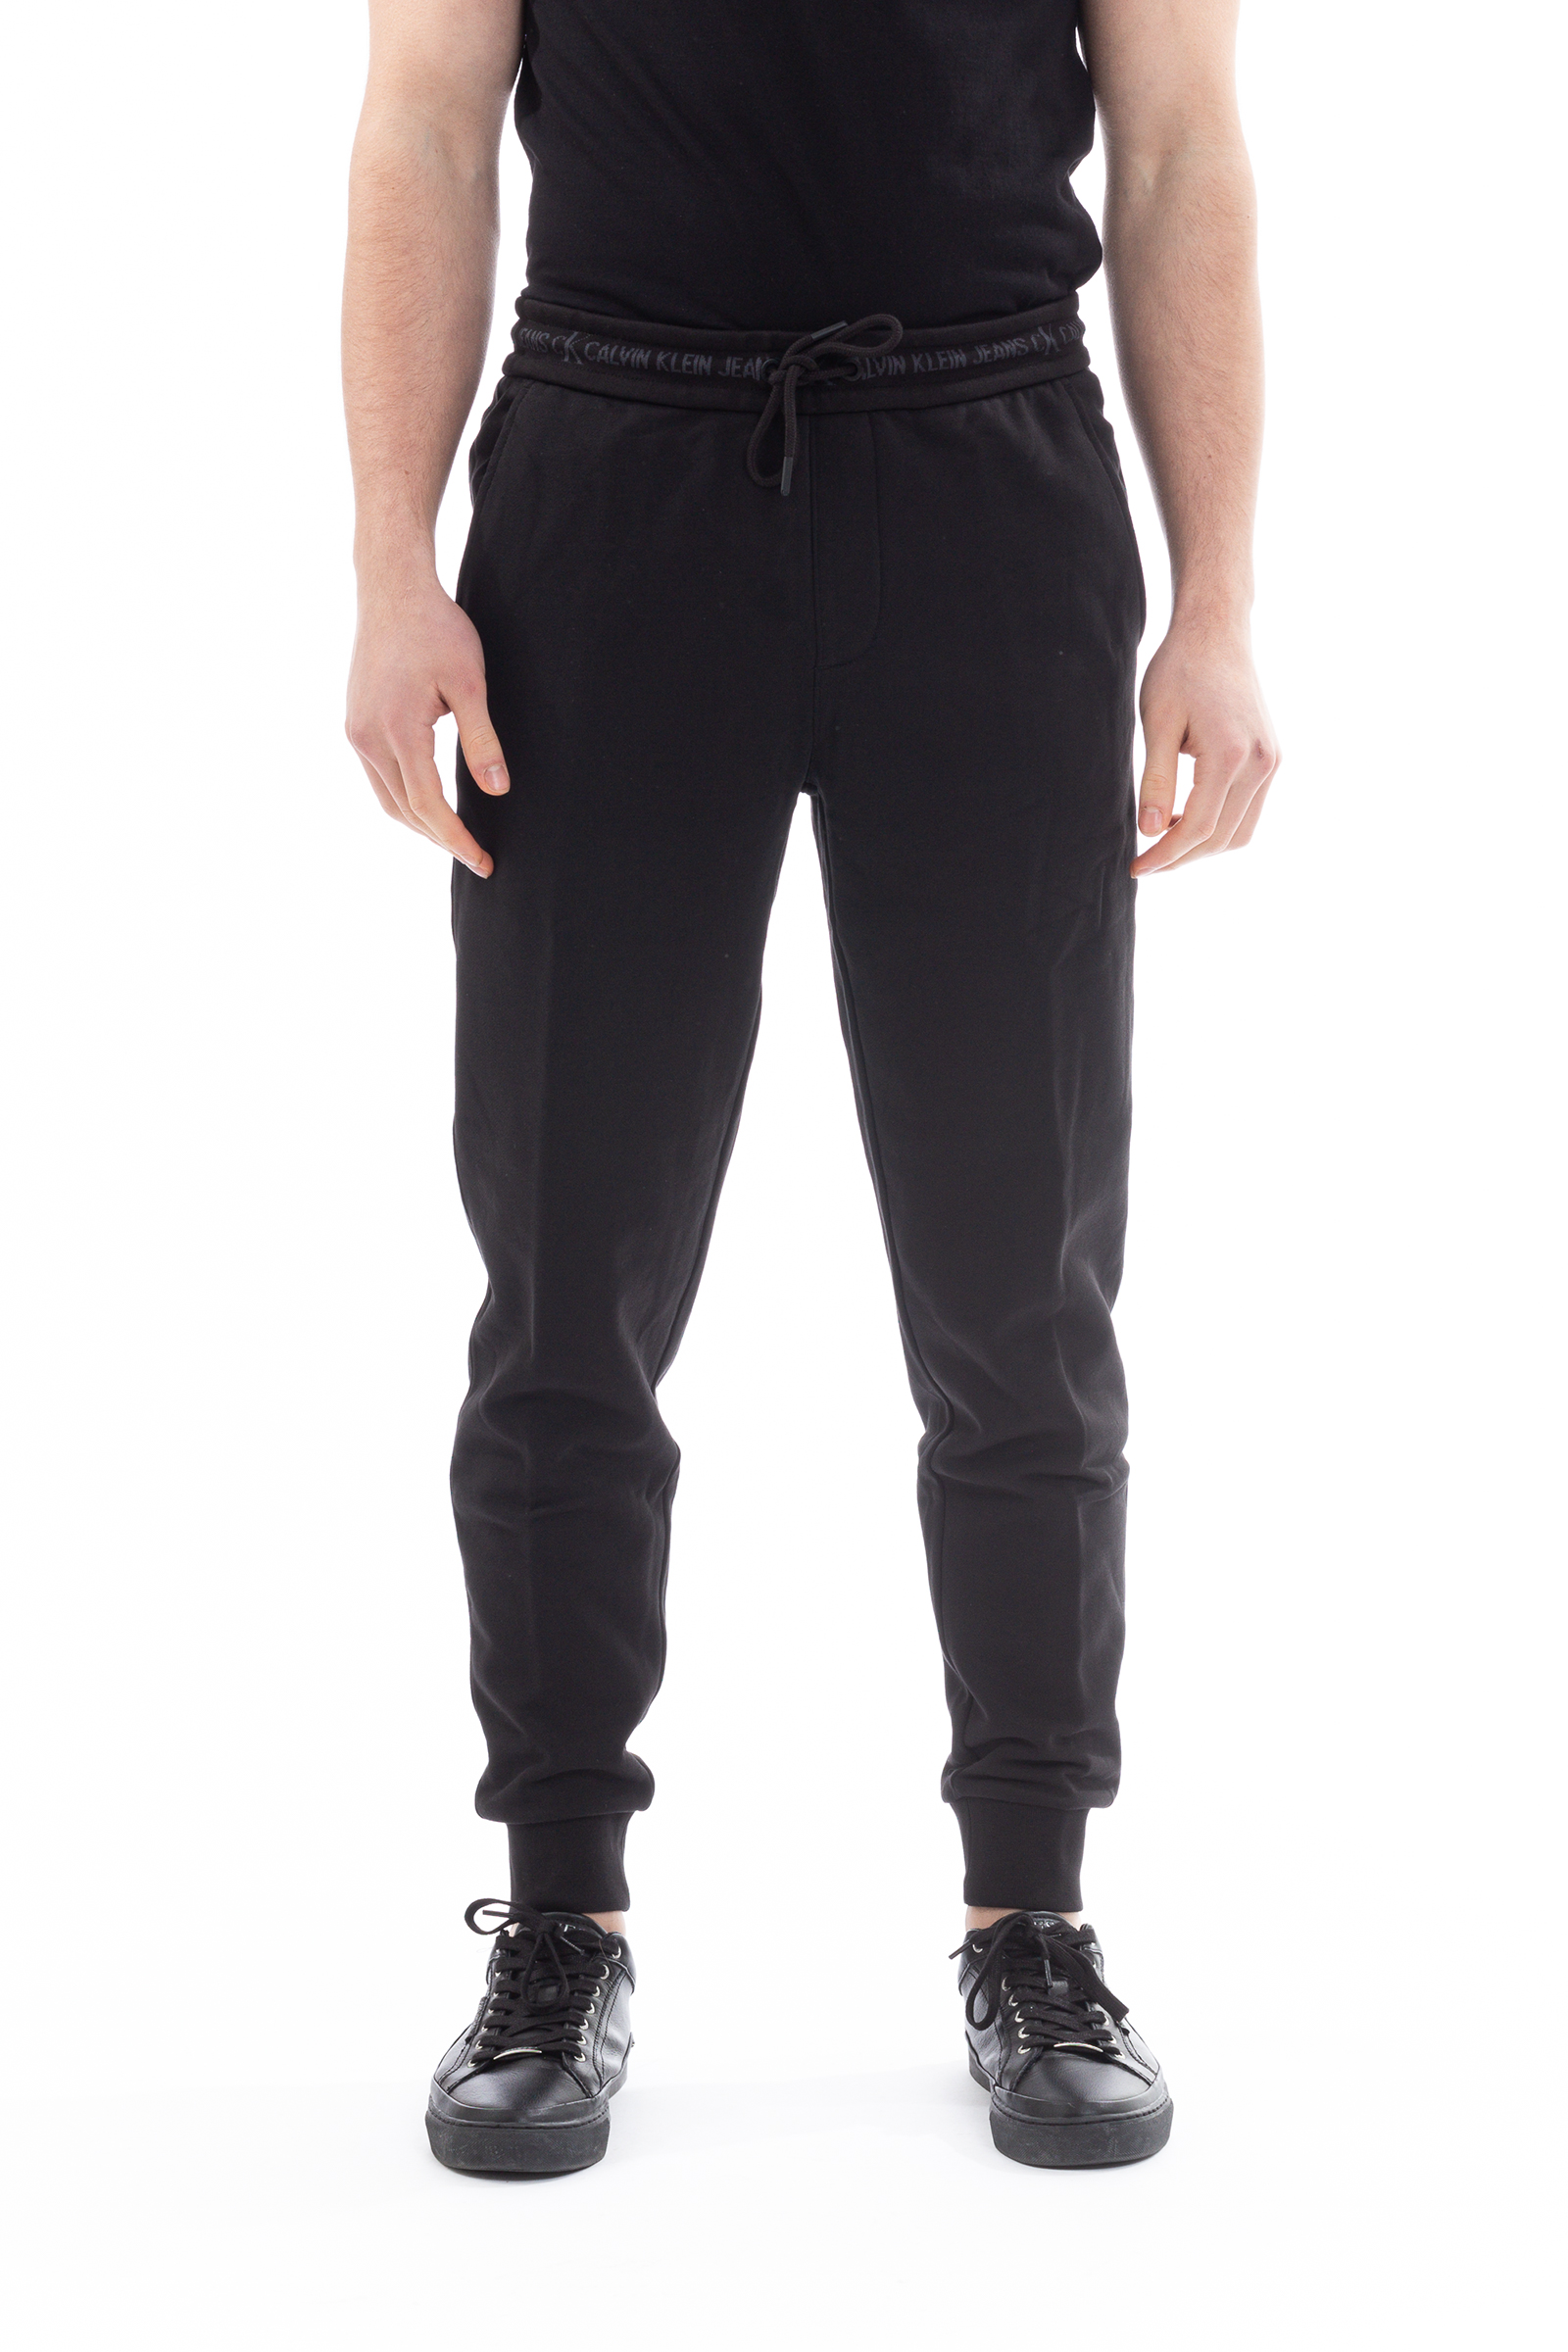 Calvin Klein Erkek Jogger Pantolon